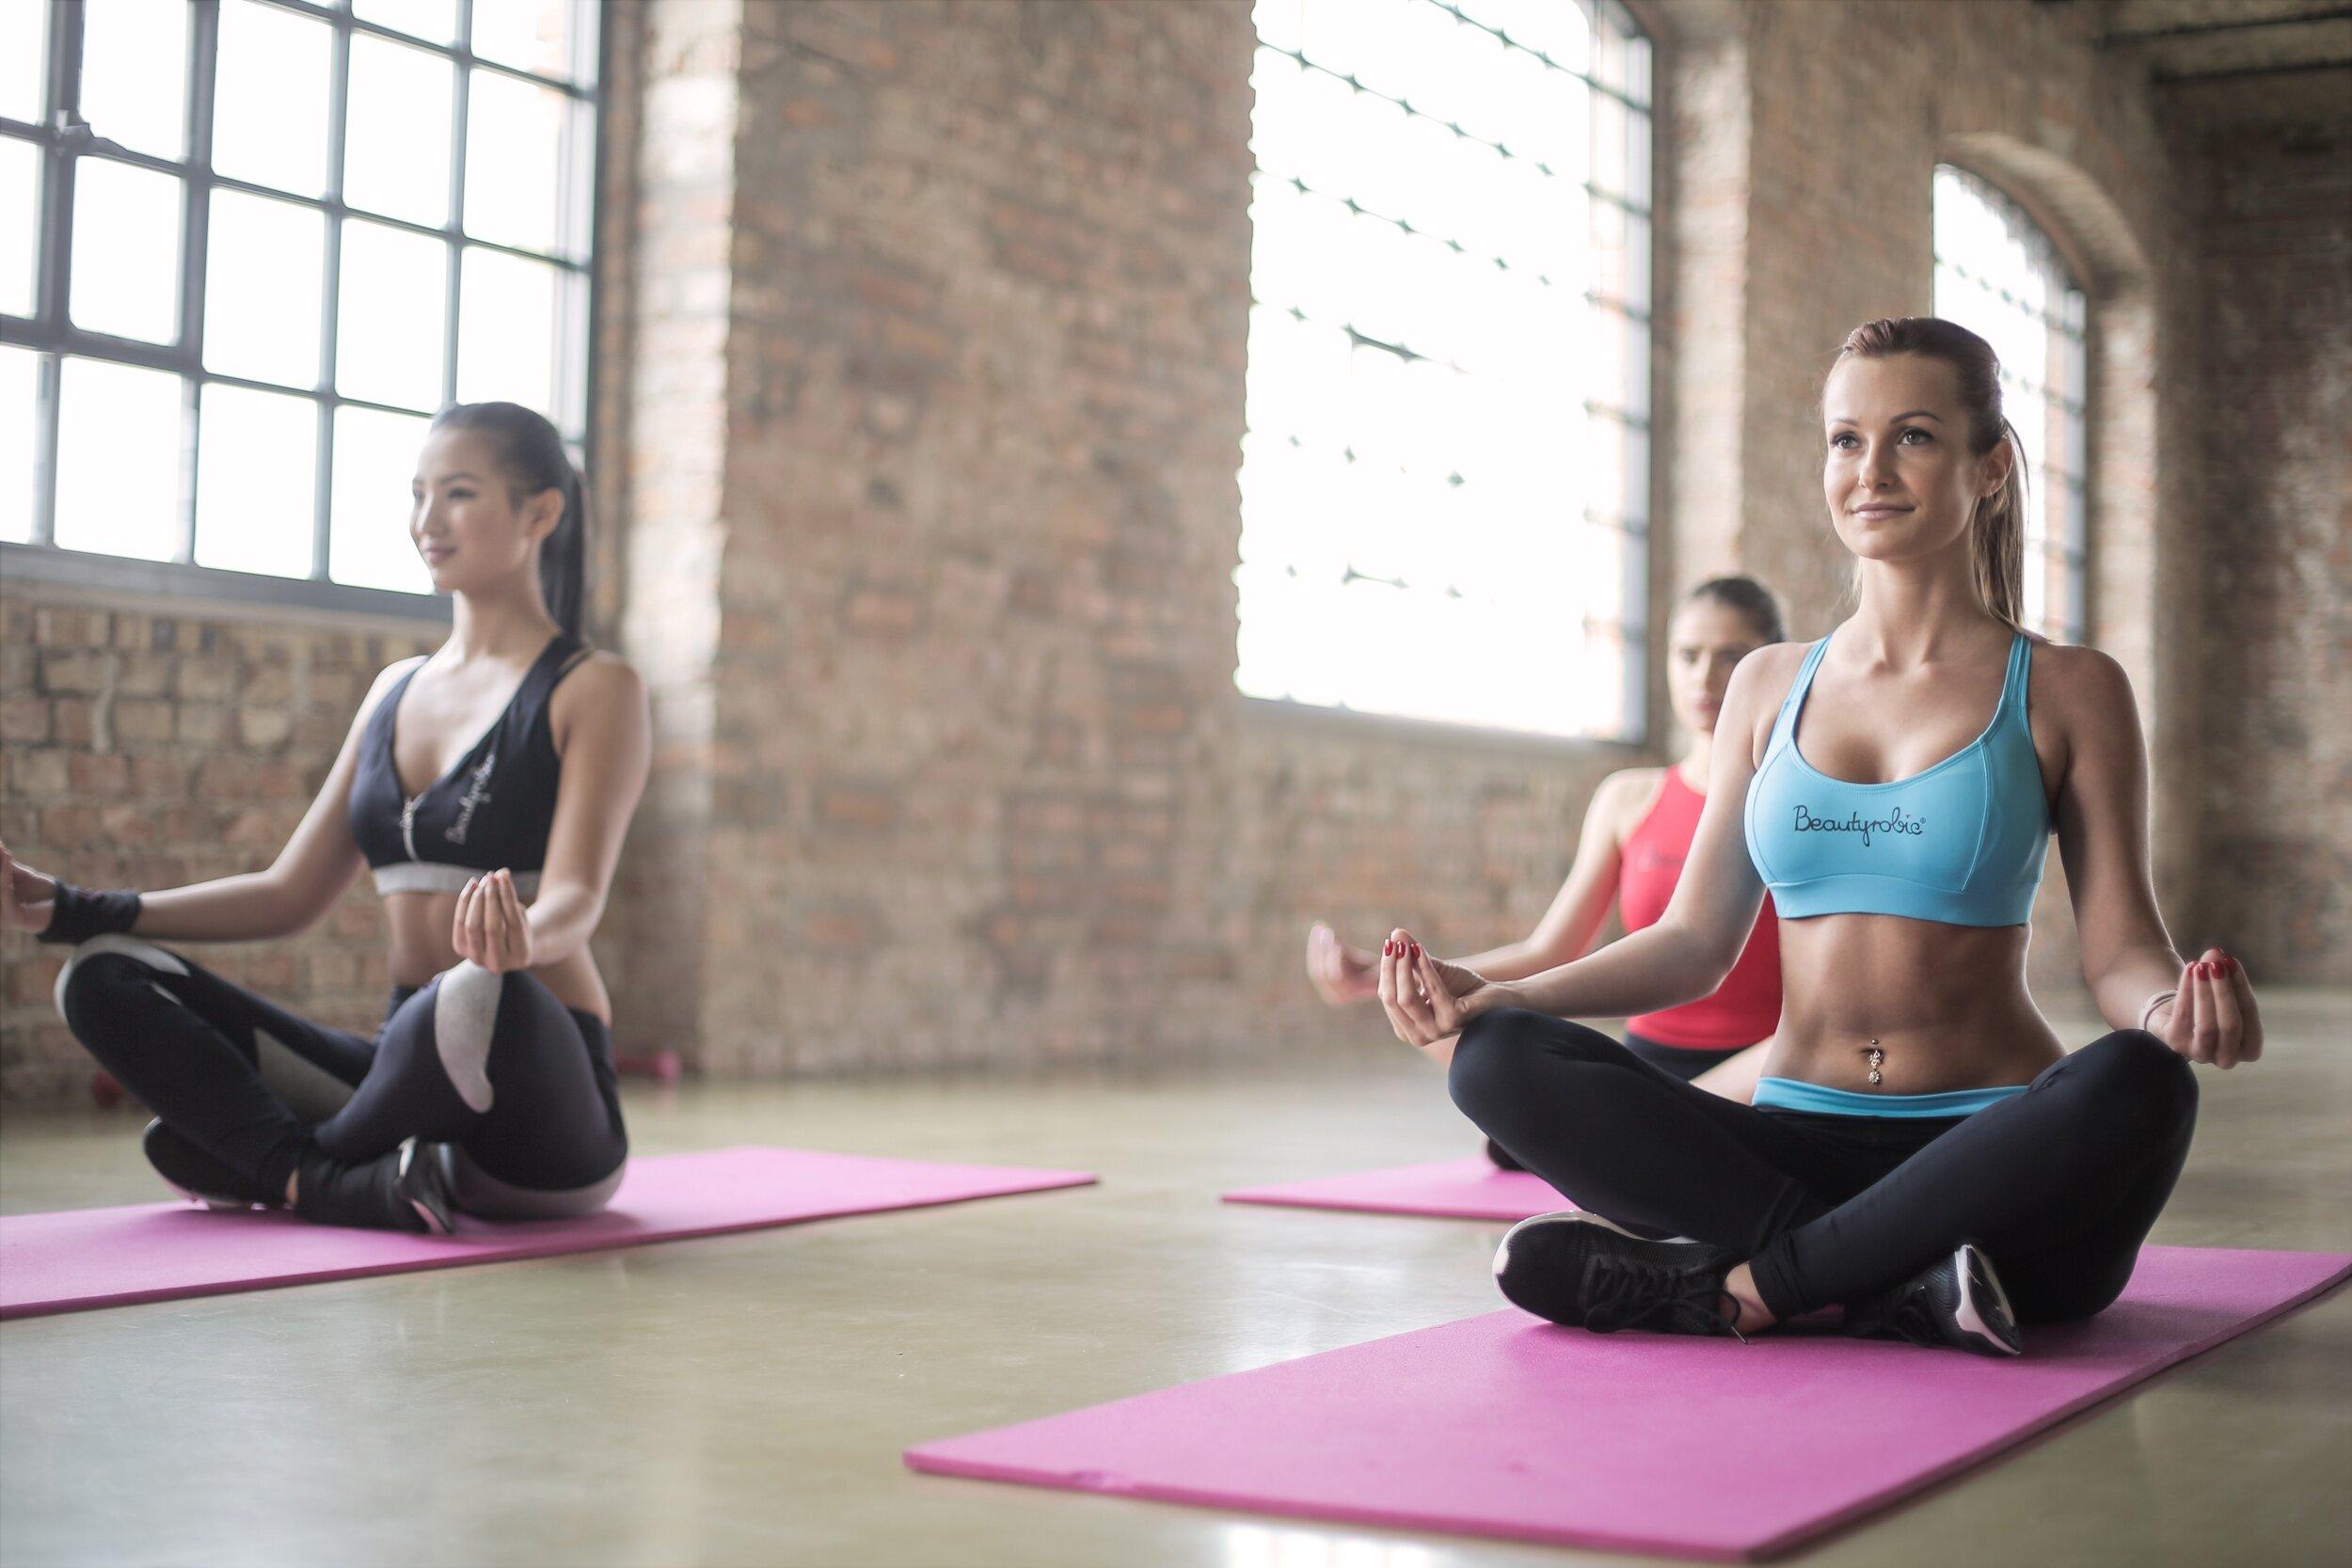 Yoga Website and App